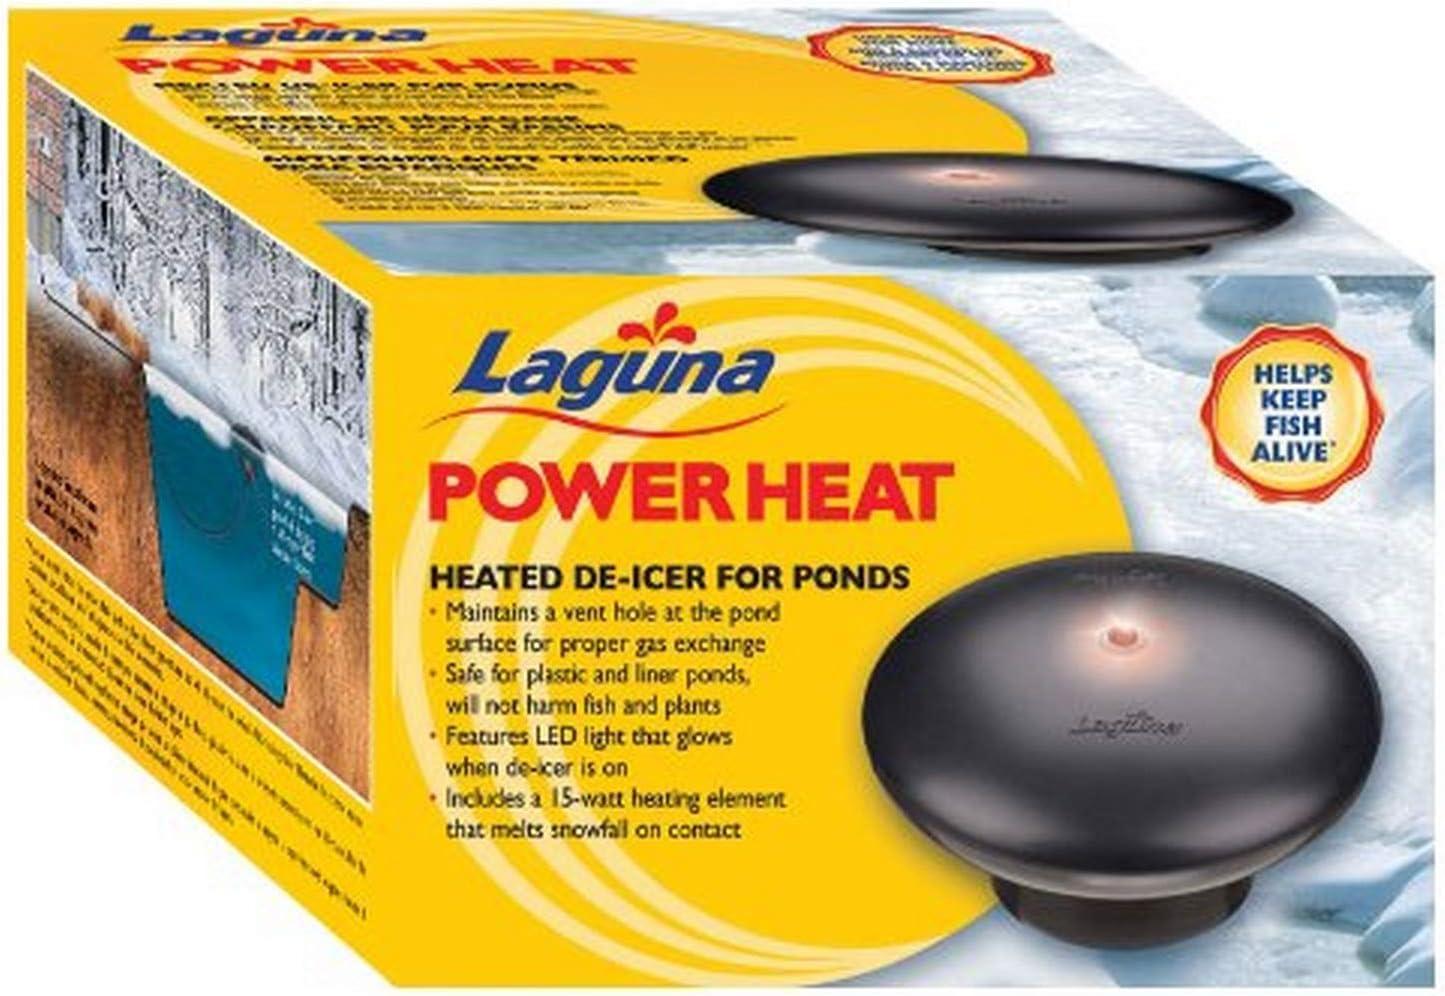 Laguna PowerHeat Heated De-icer for Ponds